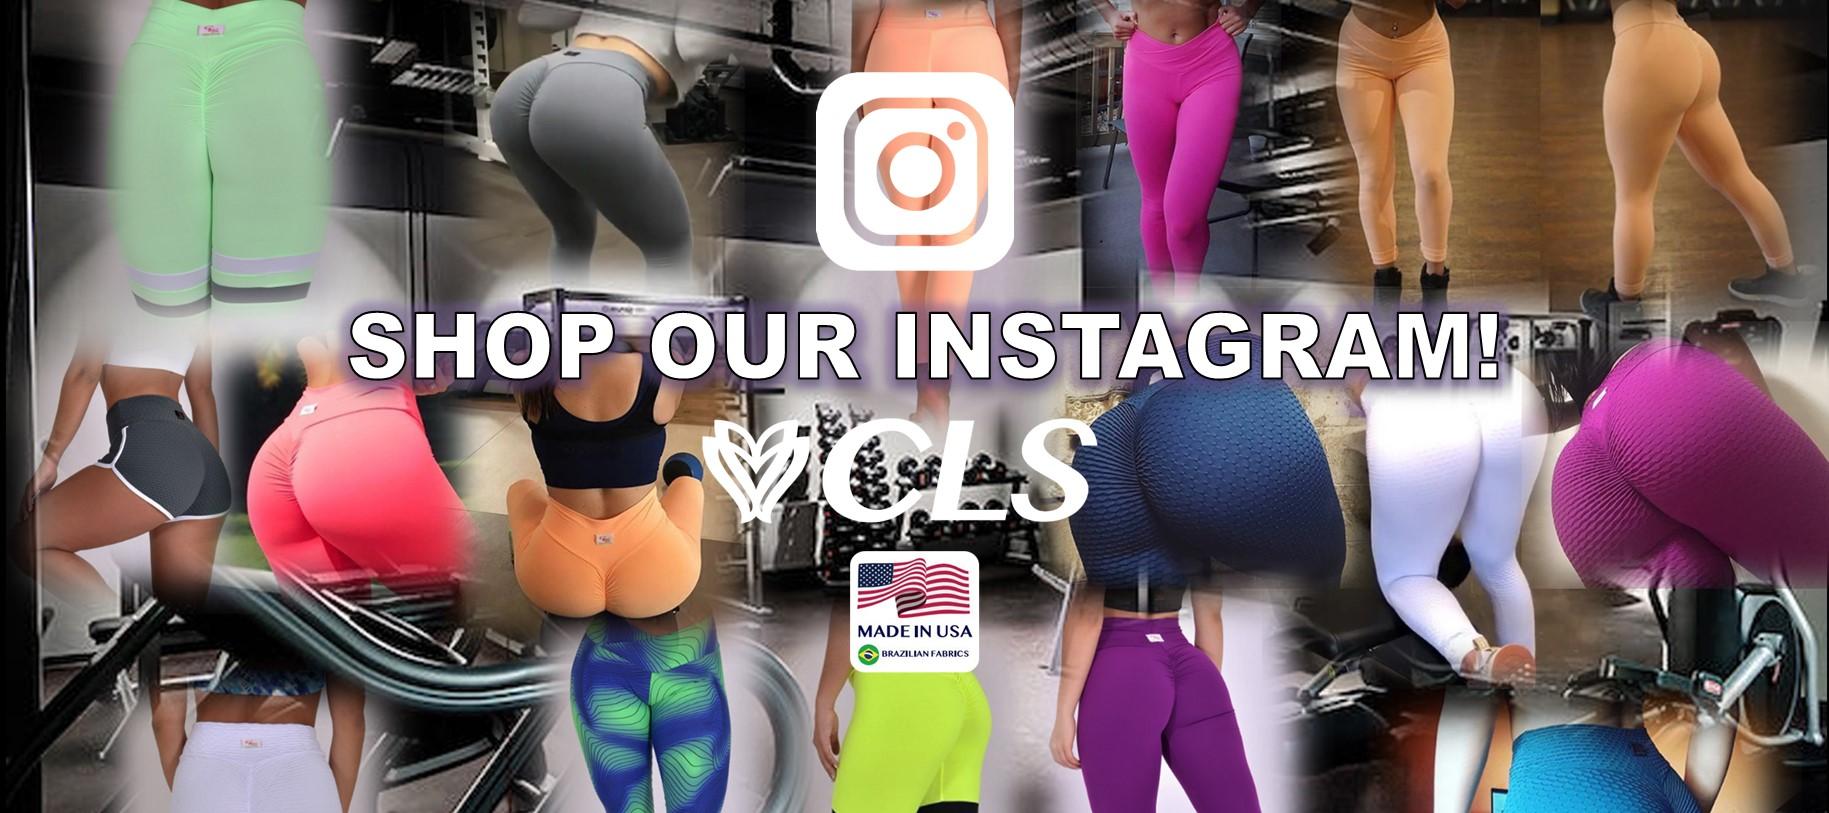 https://www.clssportswear.com/wp-content/uploads/2020/06/Shop-Our-Instagram.jpg